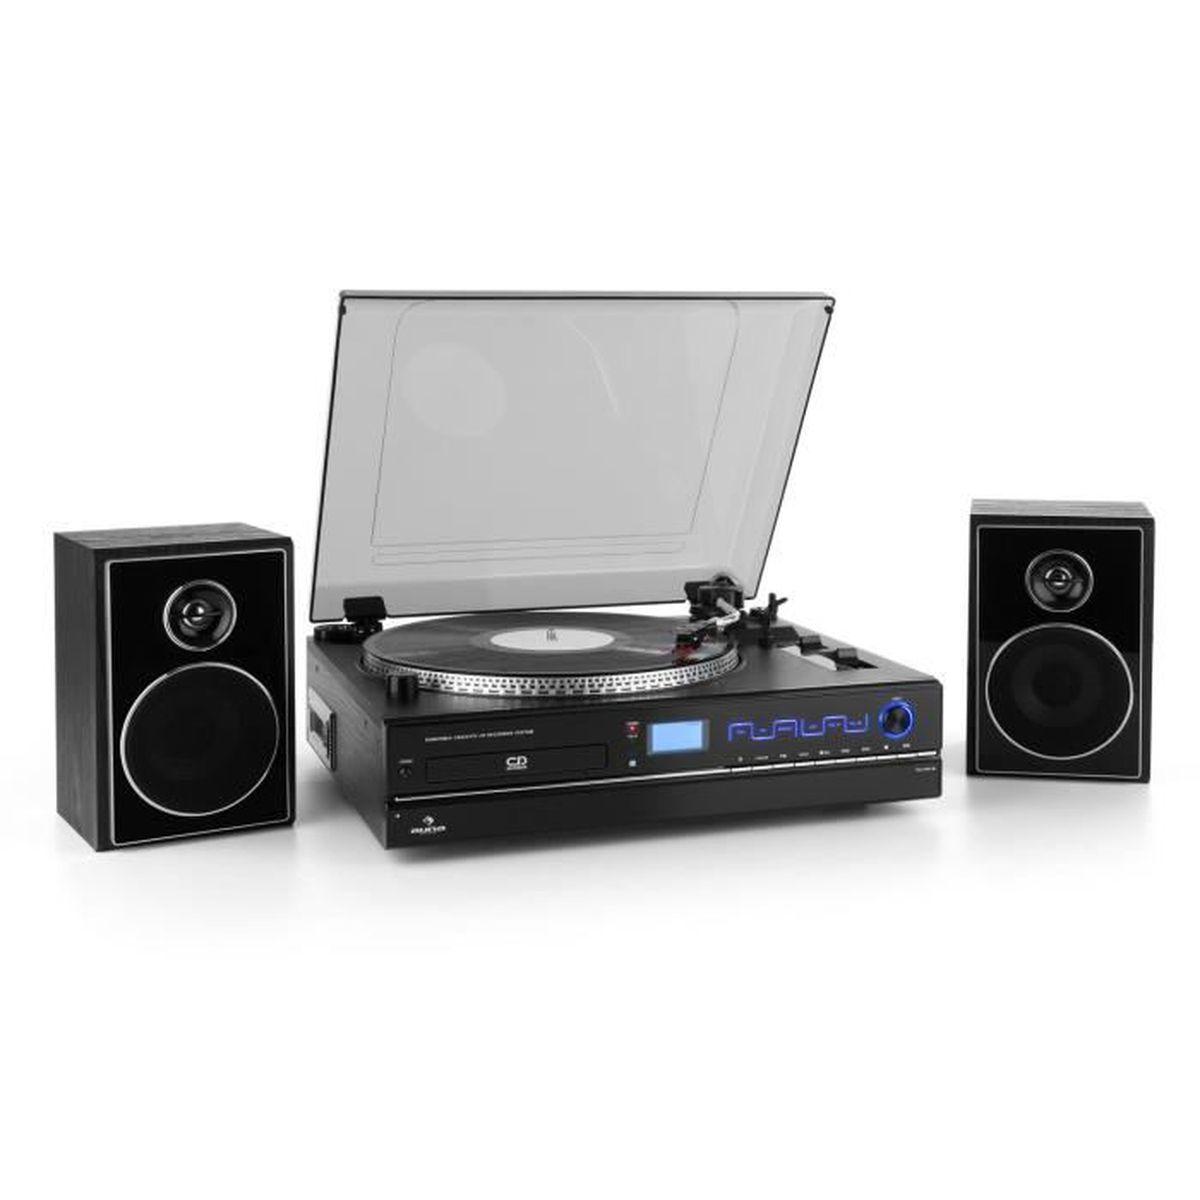 auna tcrd 993c tourne disque 33 45 u min graveur cd mc radio haut parleur chaine hi fi avis. Black Bedroom Furniture Sets. Home Design Ideas